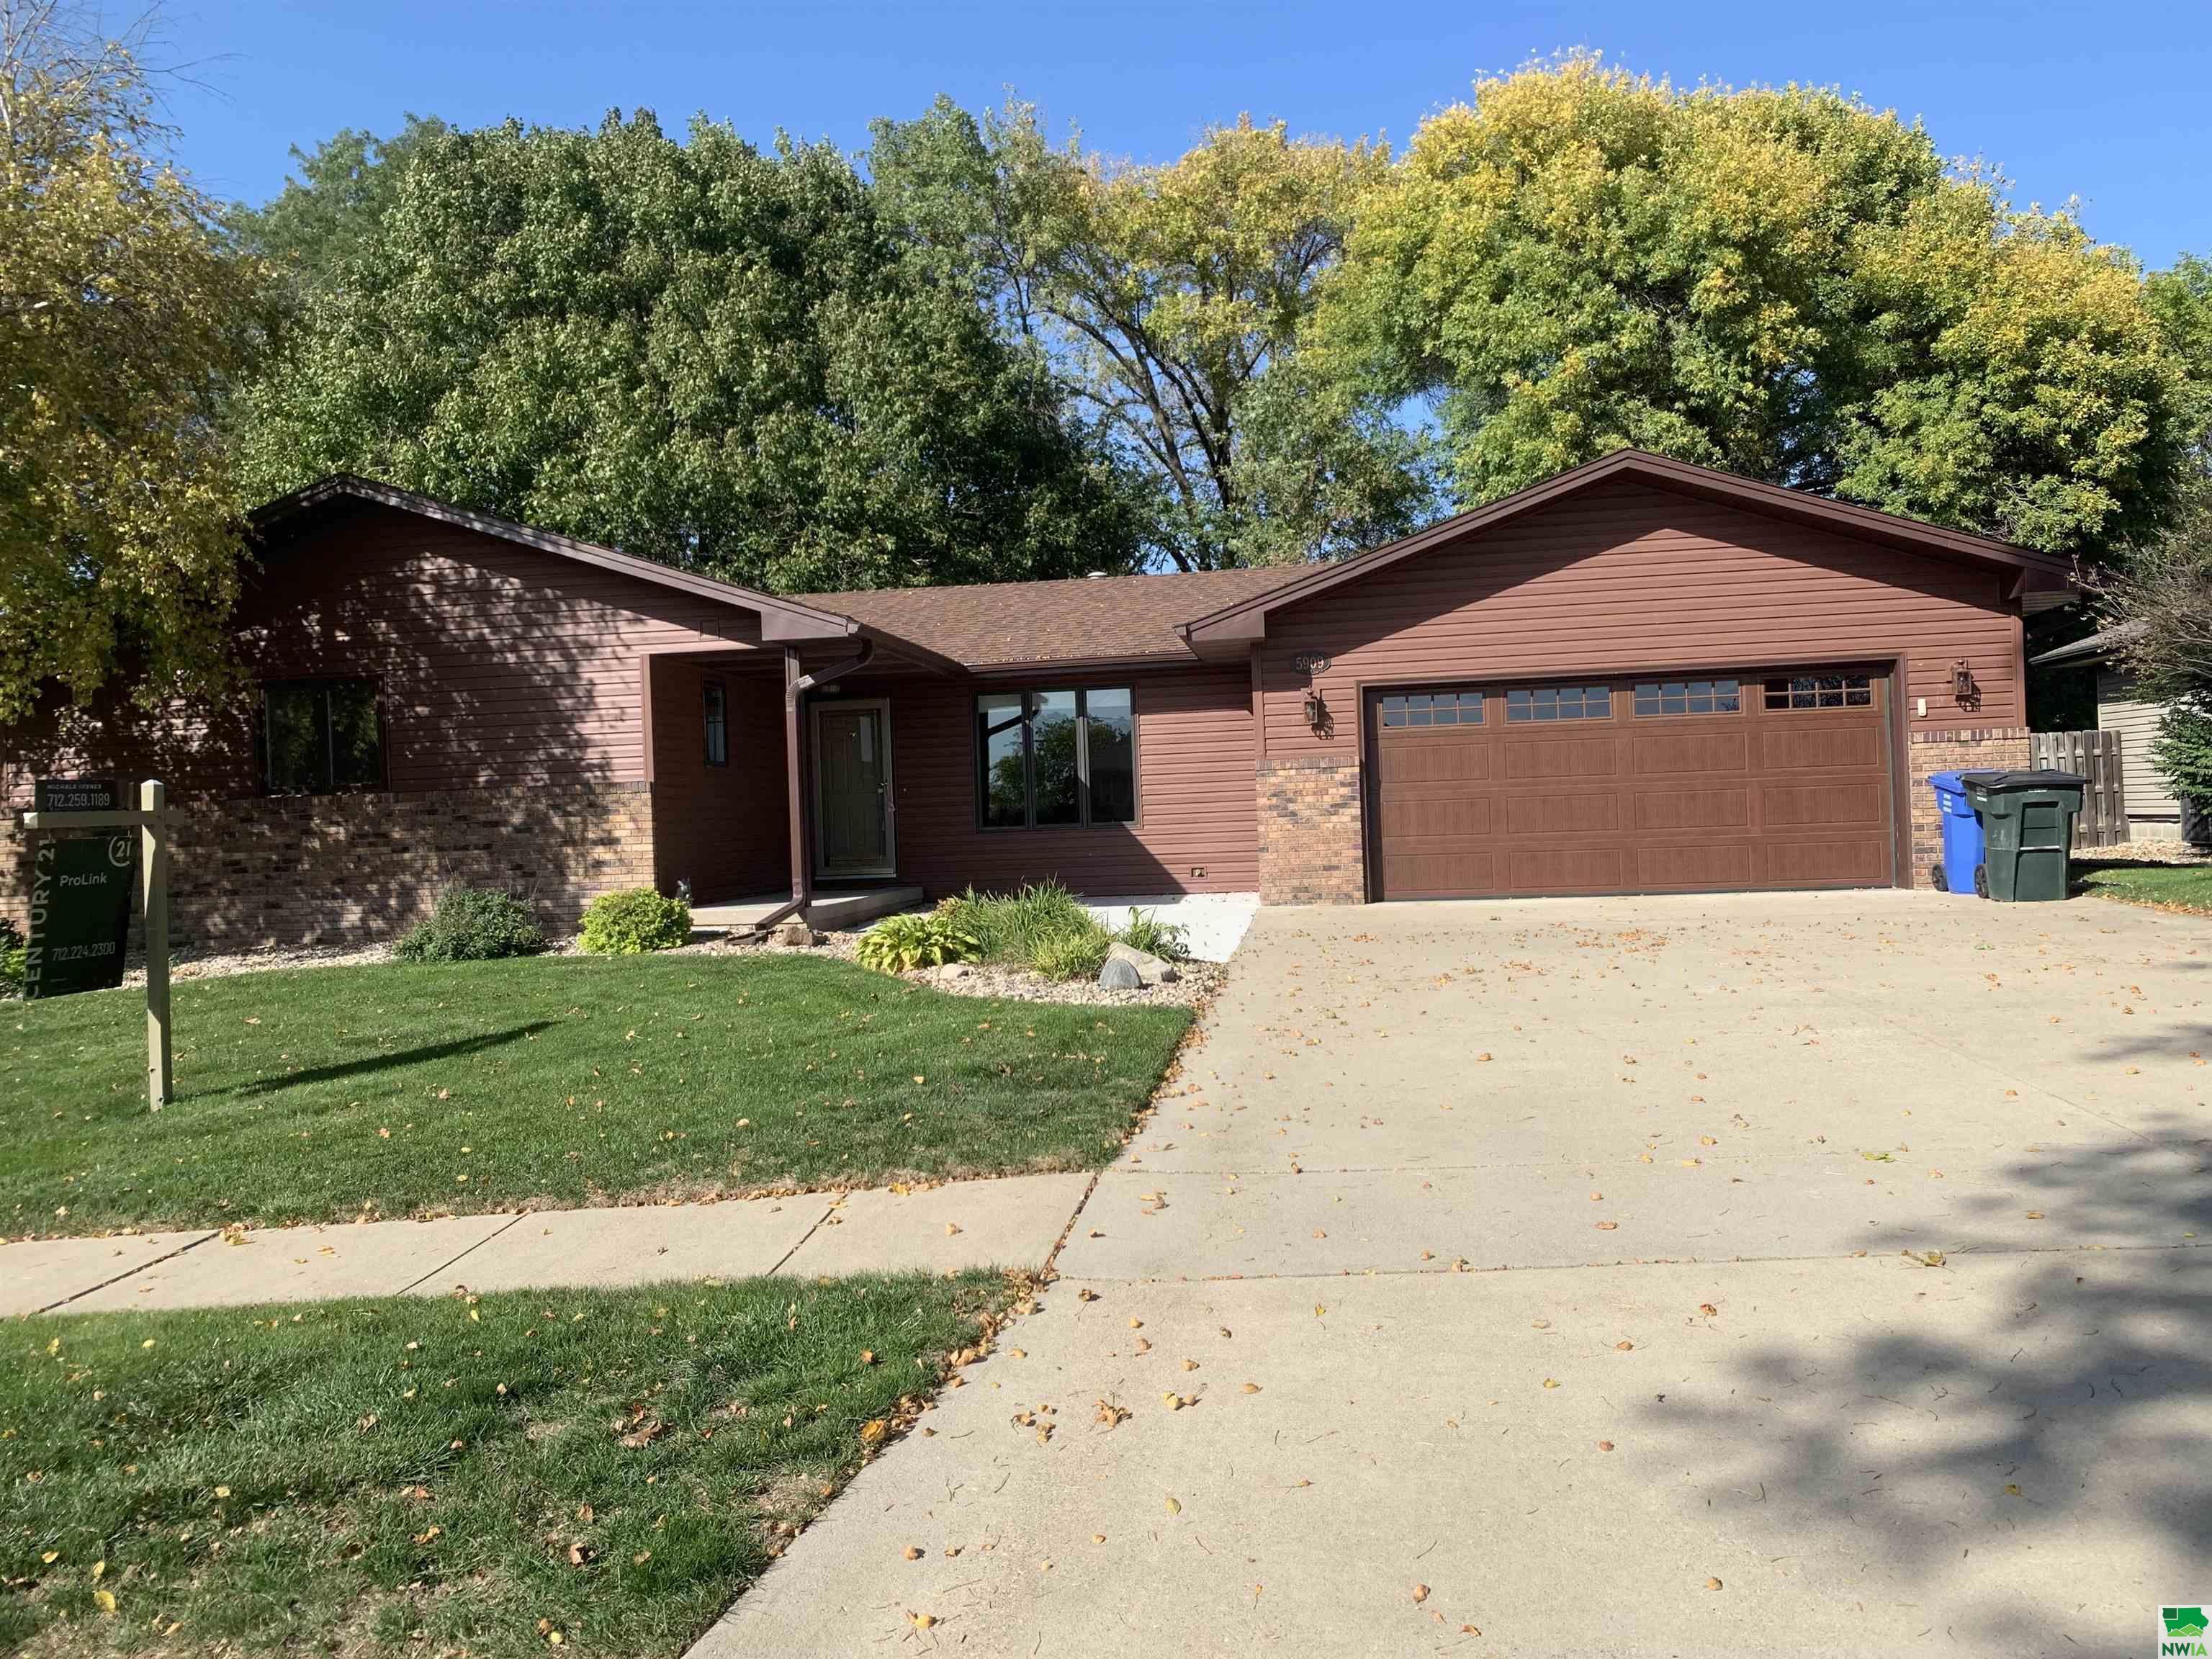 5909 Pine View Dr, Sioux City, Iowa 51106